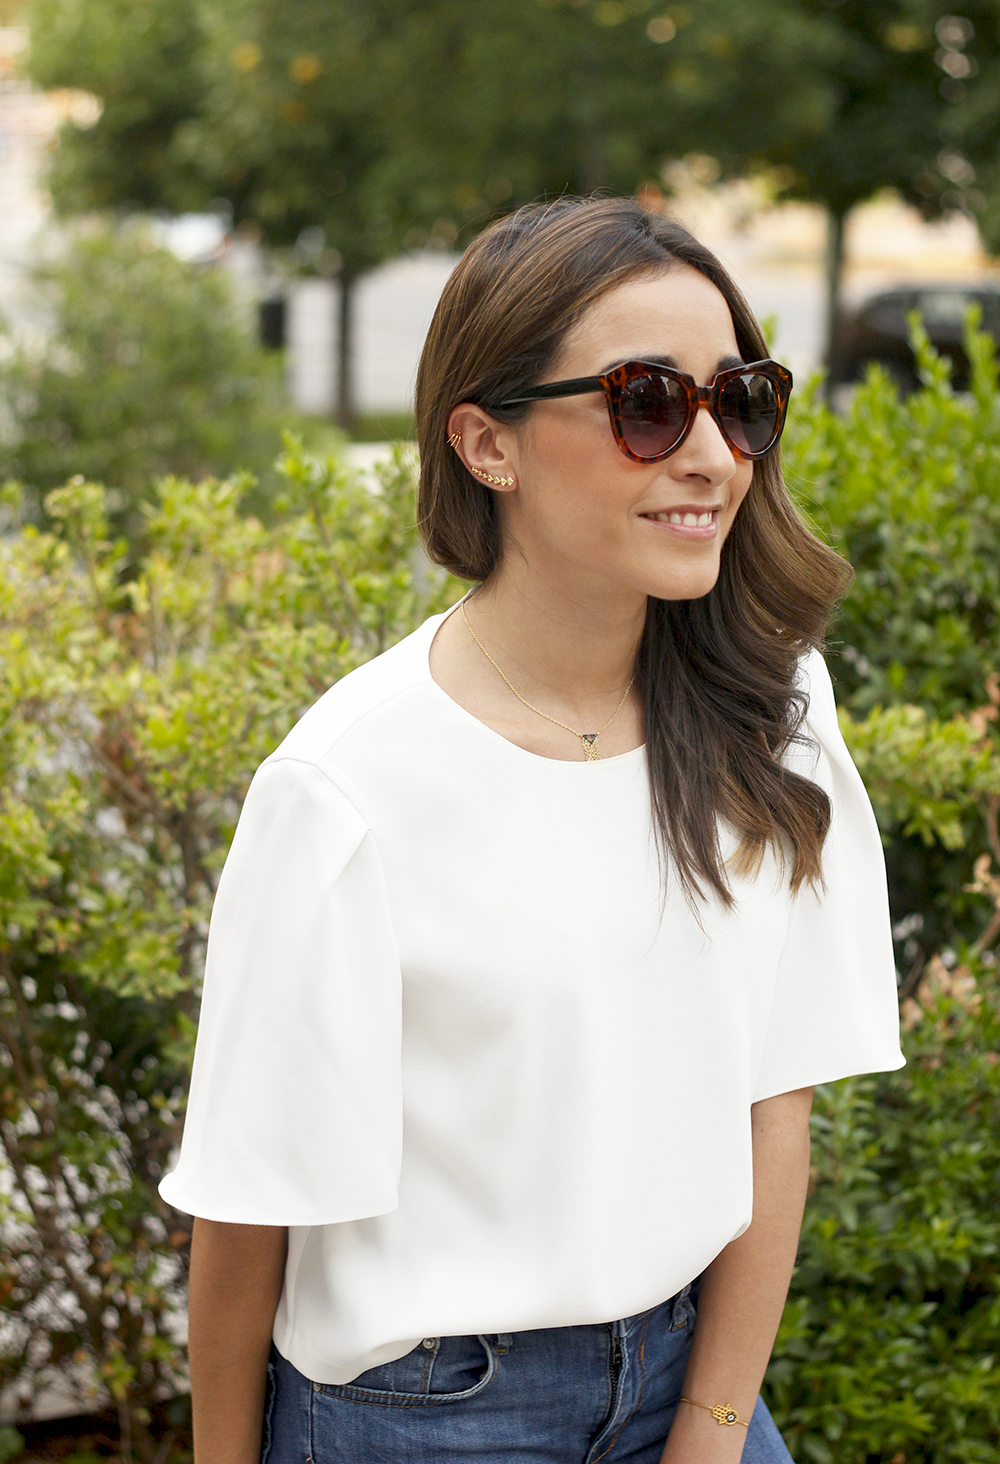 White blouse jeans earrings earcuff jewellery corte ingles joyería verano summer outfit style5